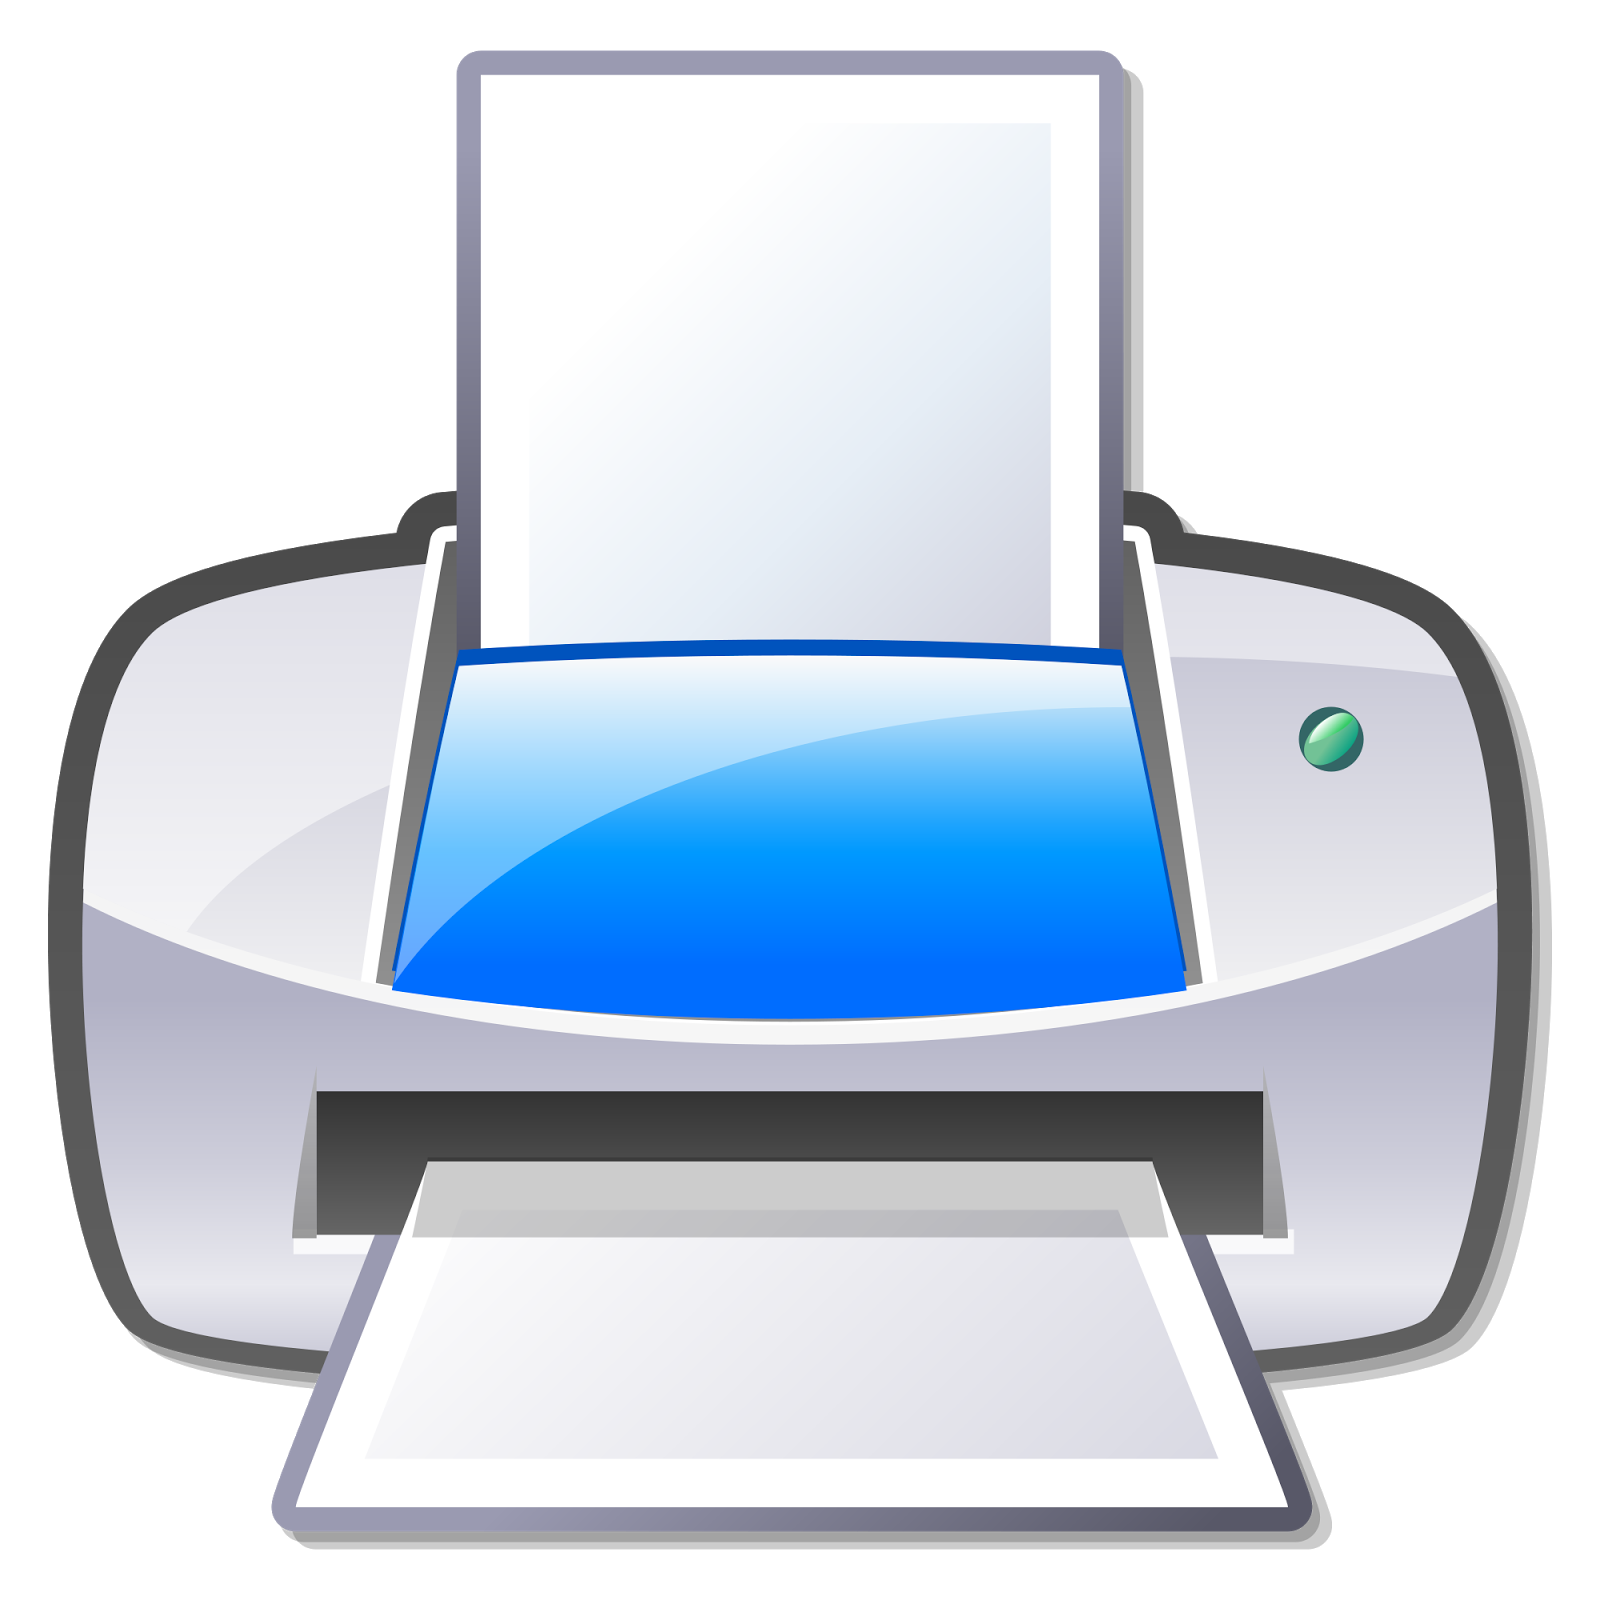 Laptop clipart animasi, Laptop animasi Transparent FREE ...